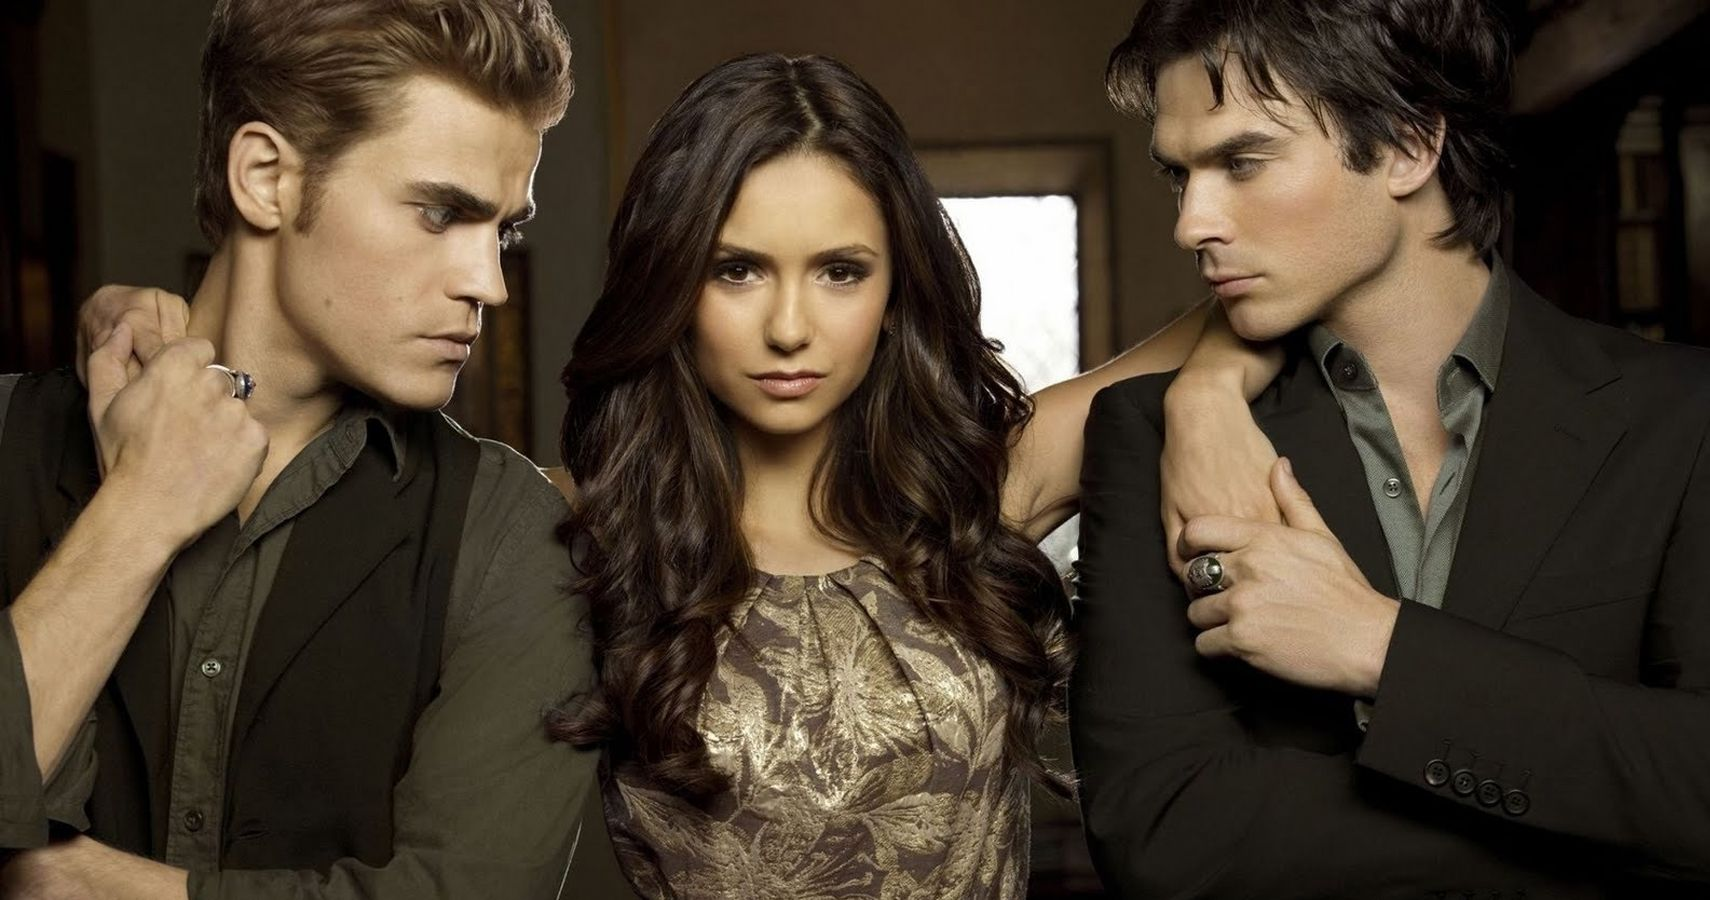 19 Wild Details Behind The Making Of Vampire Diaries